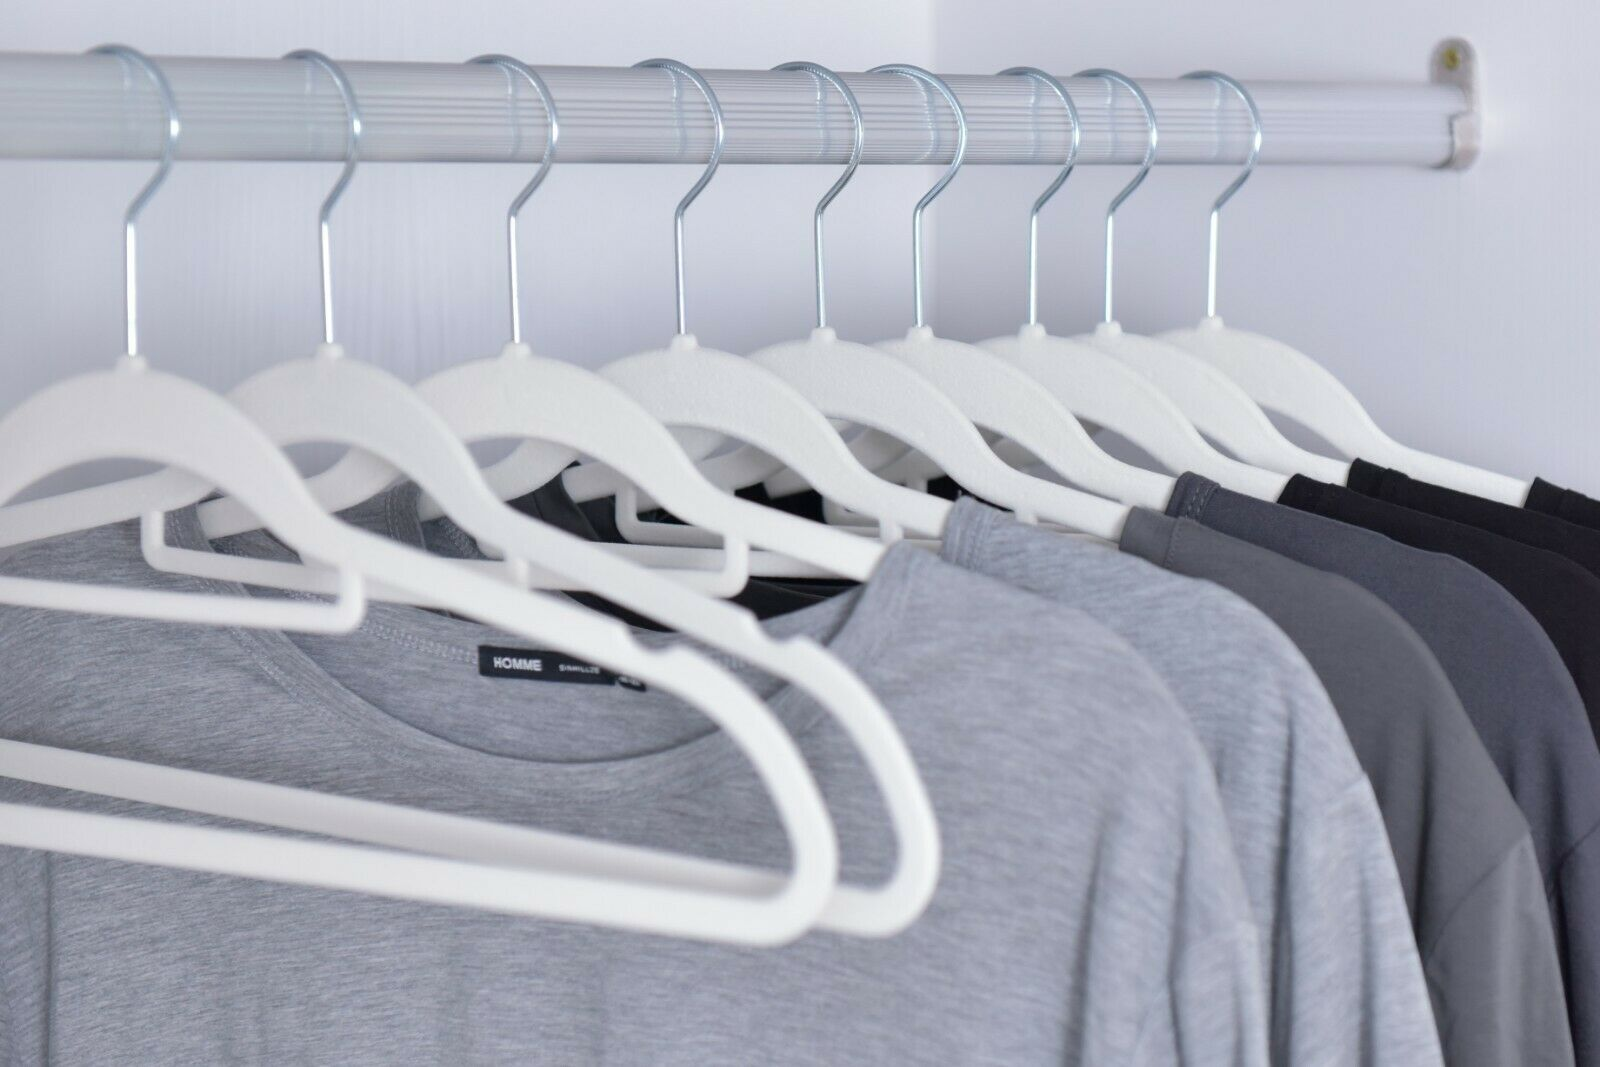 Non slip Coat Hangerplastic Clothes Hanger Buy High Quality Velvet Hangers,Coat Hanger,Clothes Hangers Product on